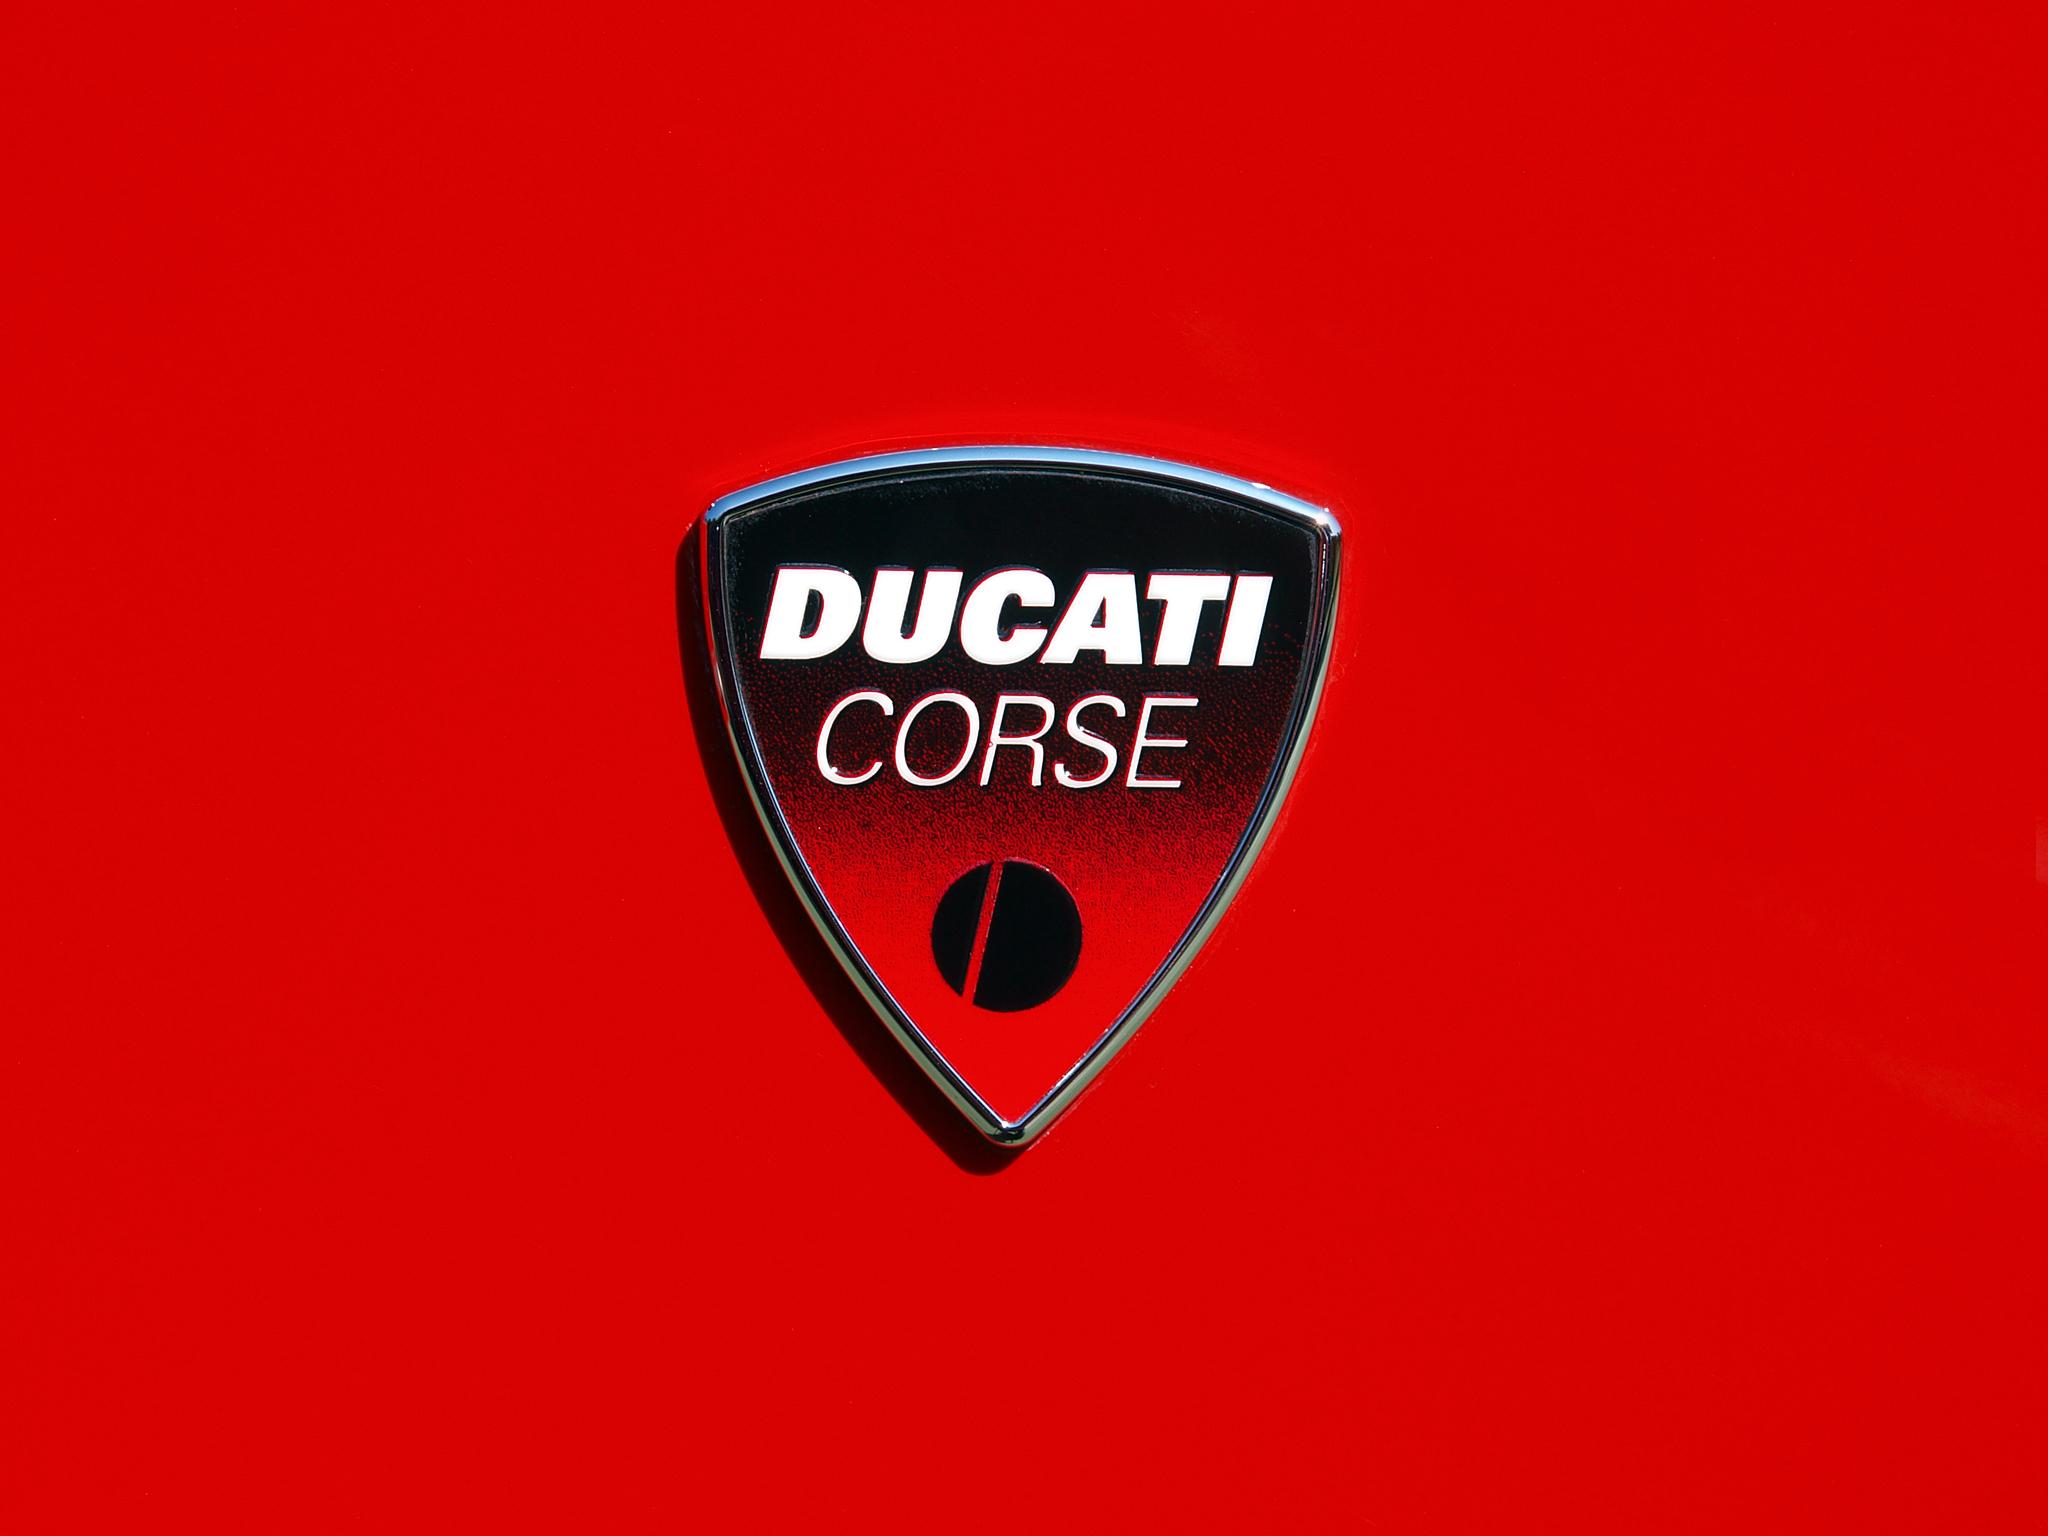 Alfa Romeo 147 Ducati Corse JP spec Wallpapers Cool Cars Wallpaper 2048x1536